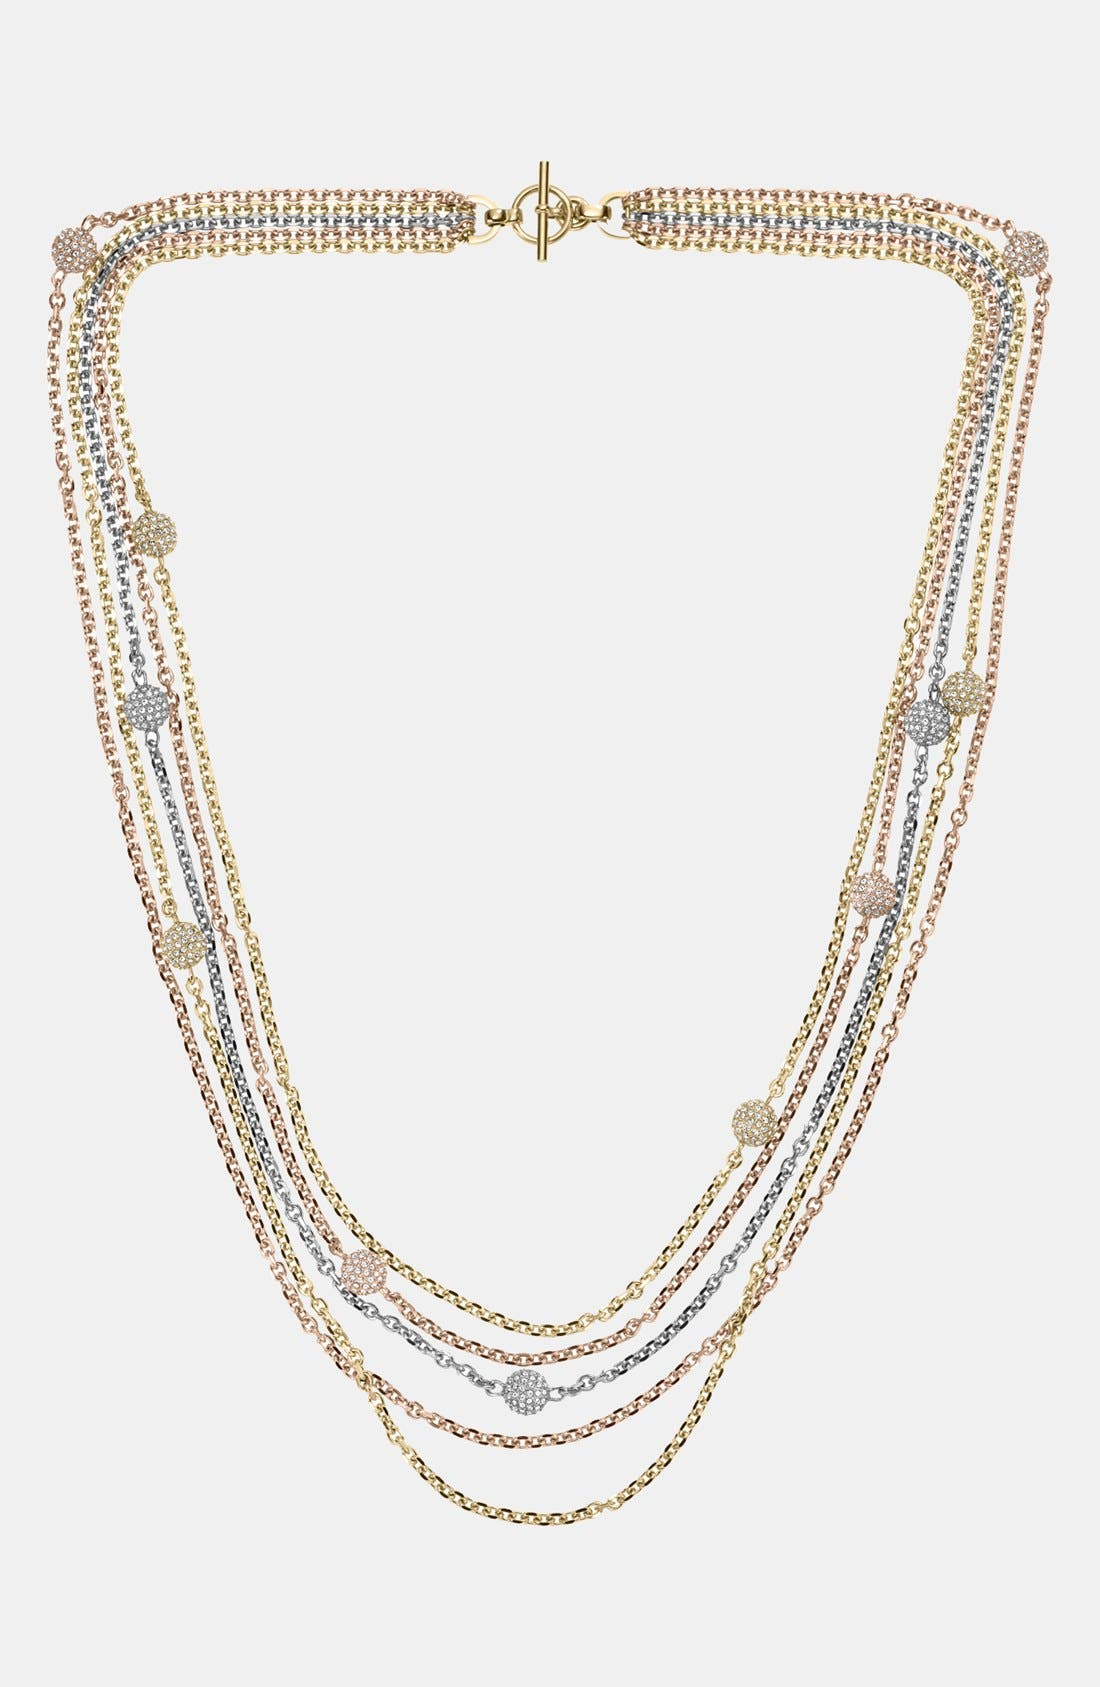 Main Image - Michael Kors 'Fireball' Station Multistrand Necklace